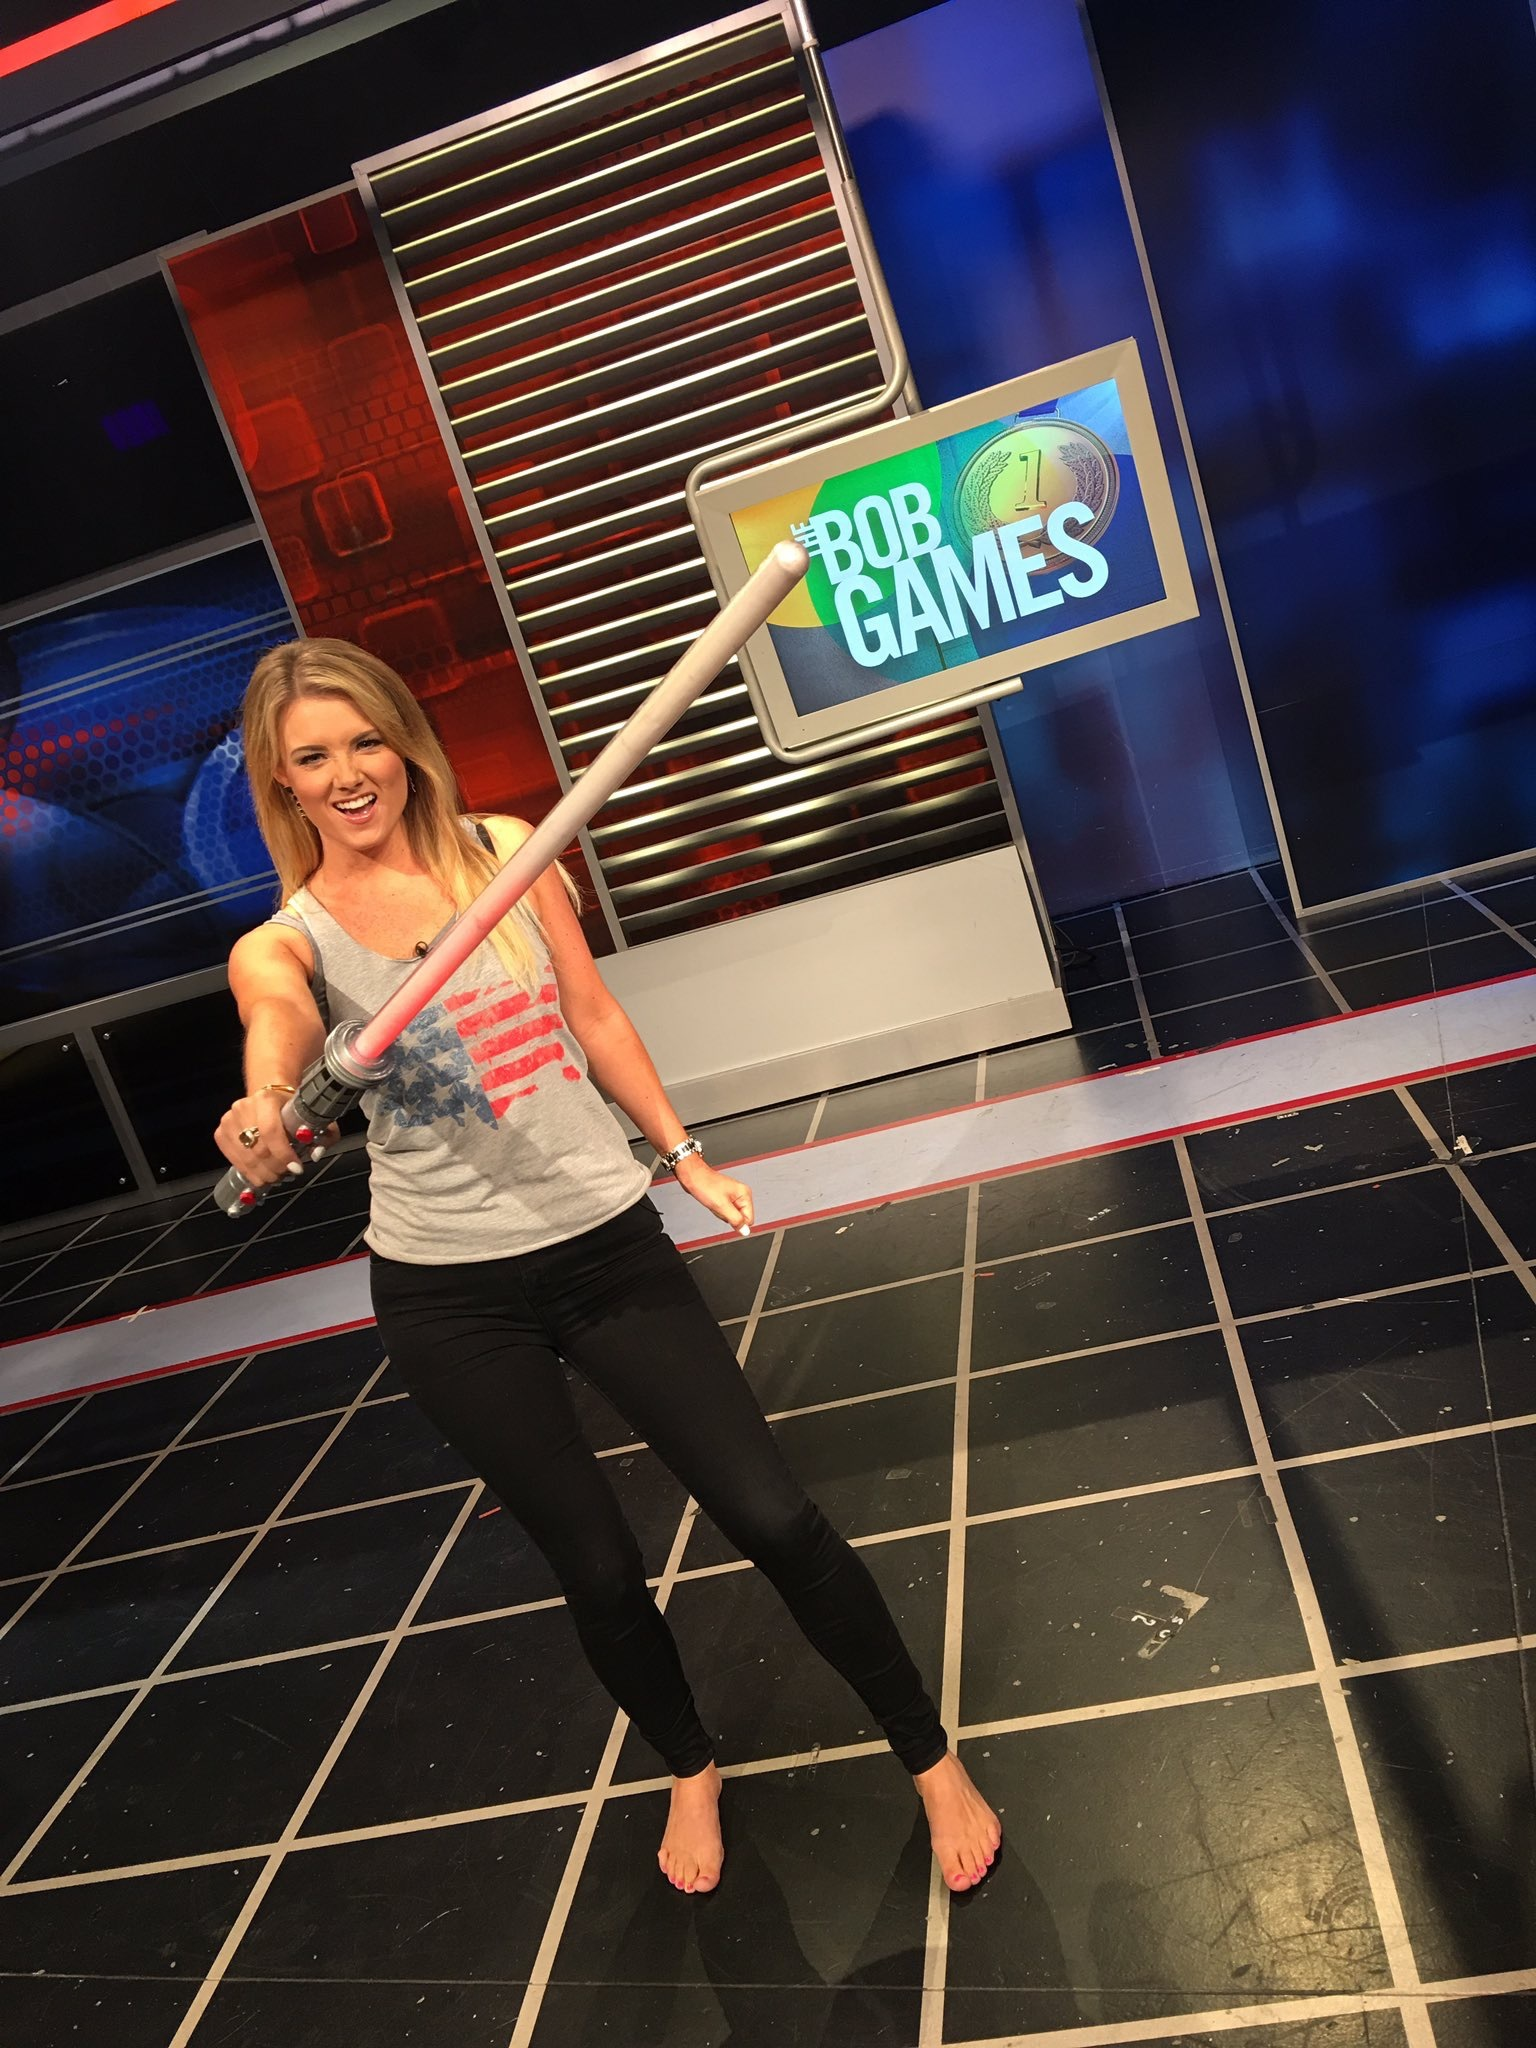 Jillian Mele's Feet - ... Jessica Biel Wikipedia